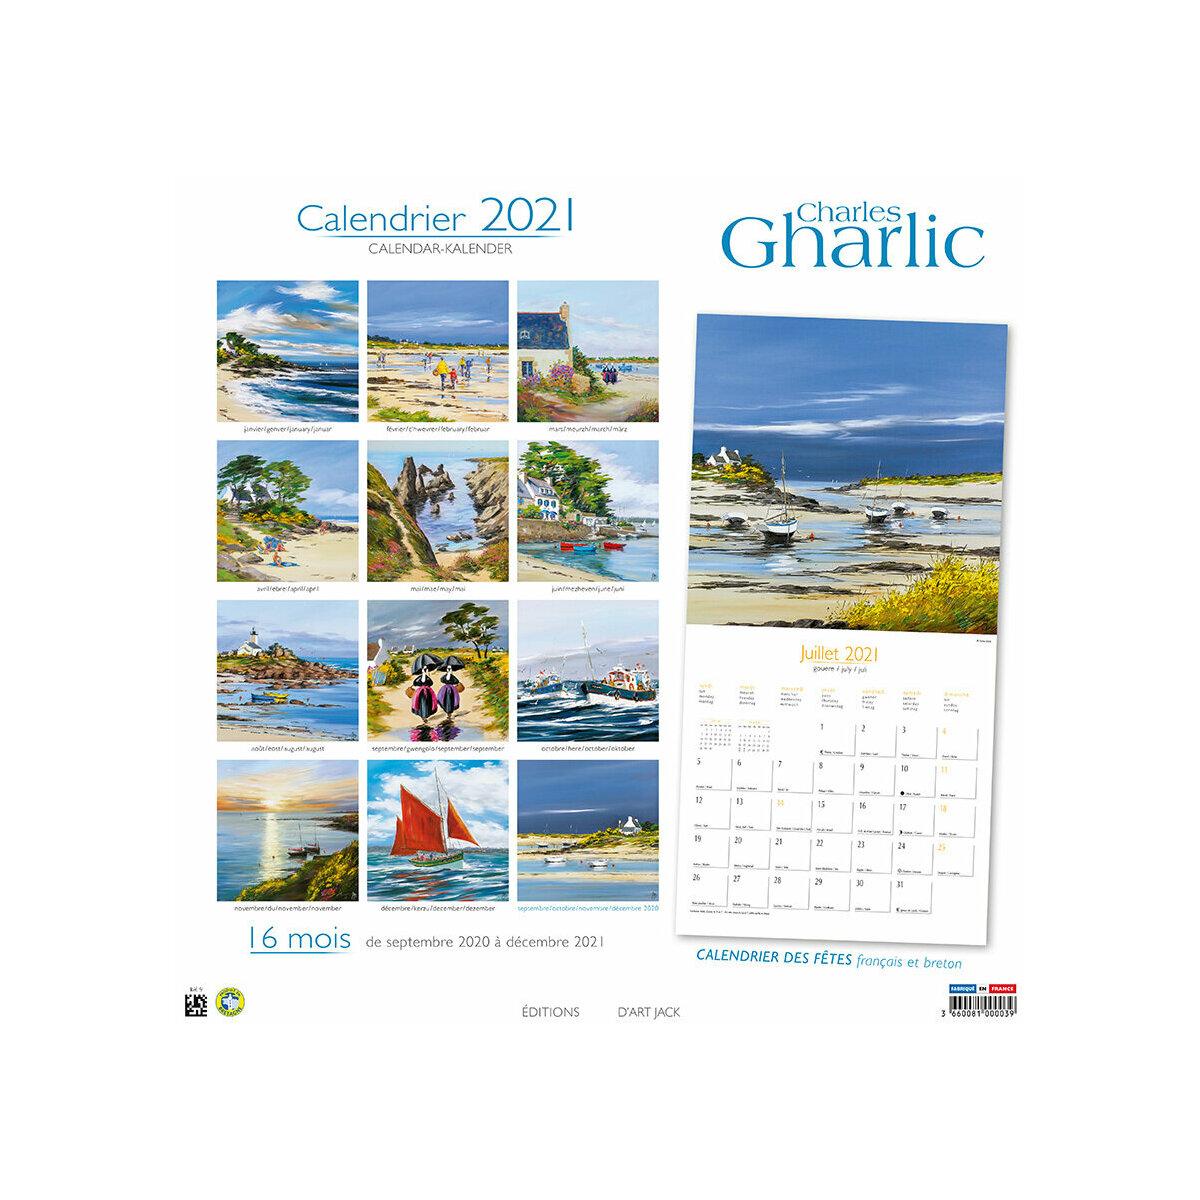 Calendrier Breton 2021 calendrier Bretagne par Charles Gharlic 2021